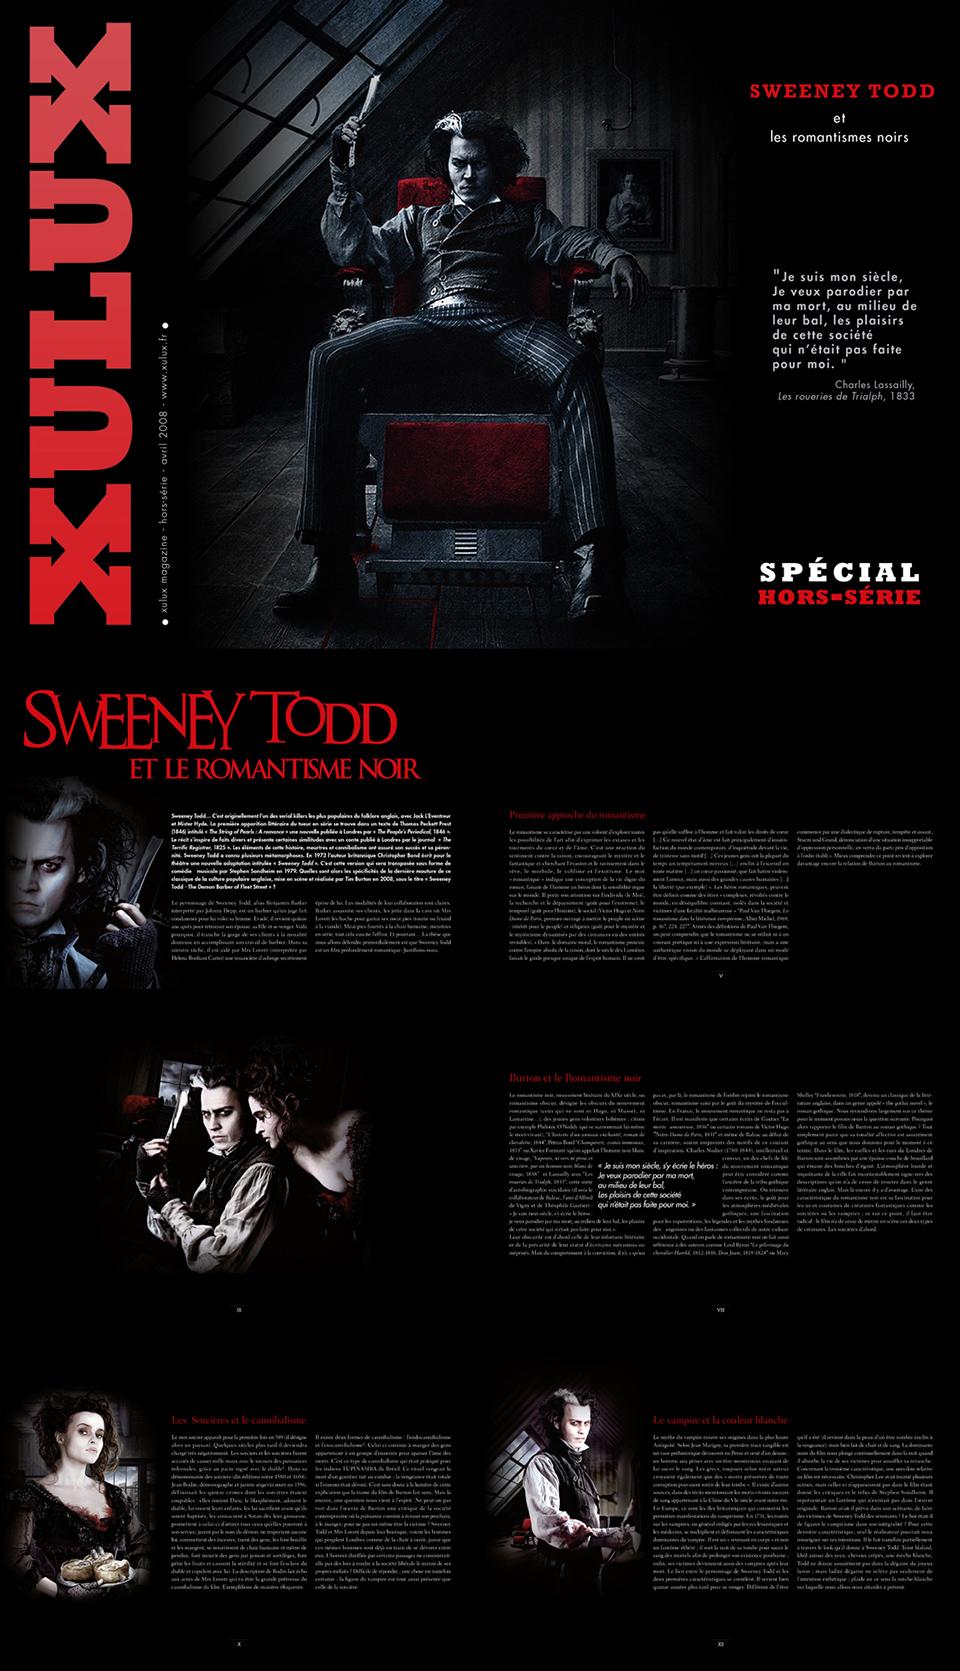 xulux Hors Série Sweeney todd réalisation da-conceicao.com